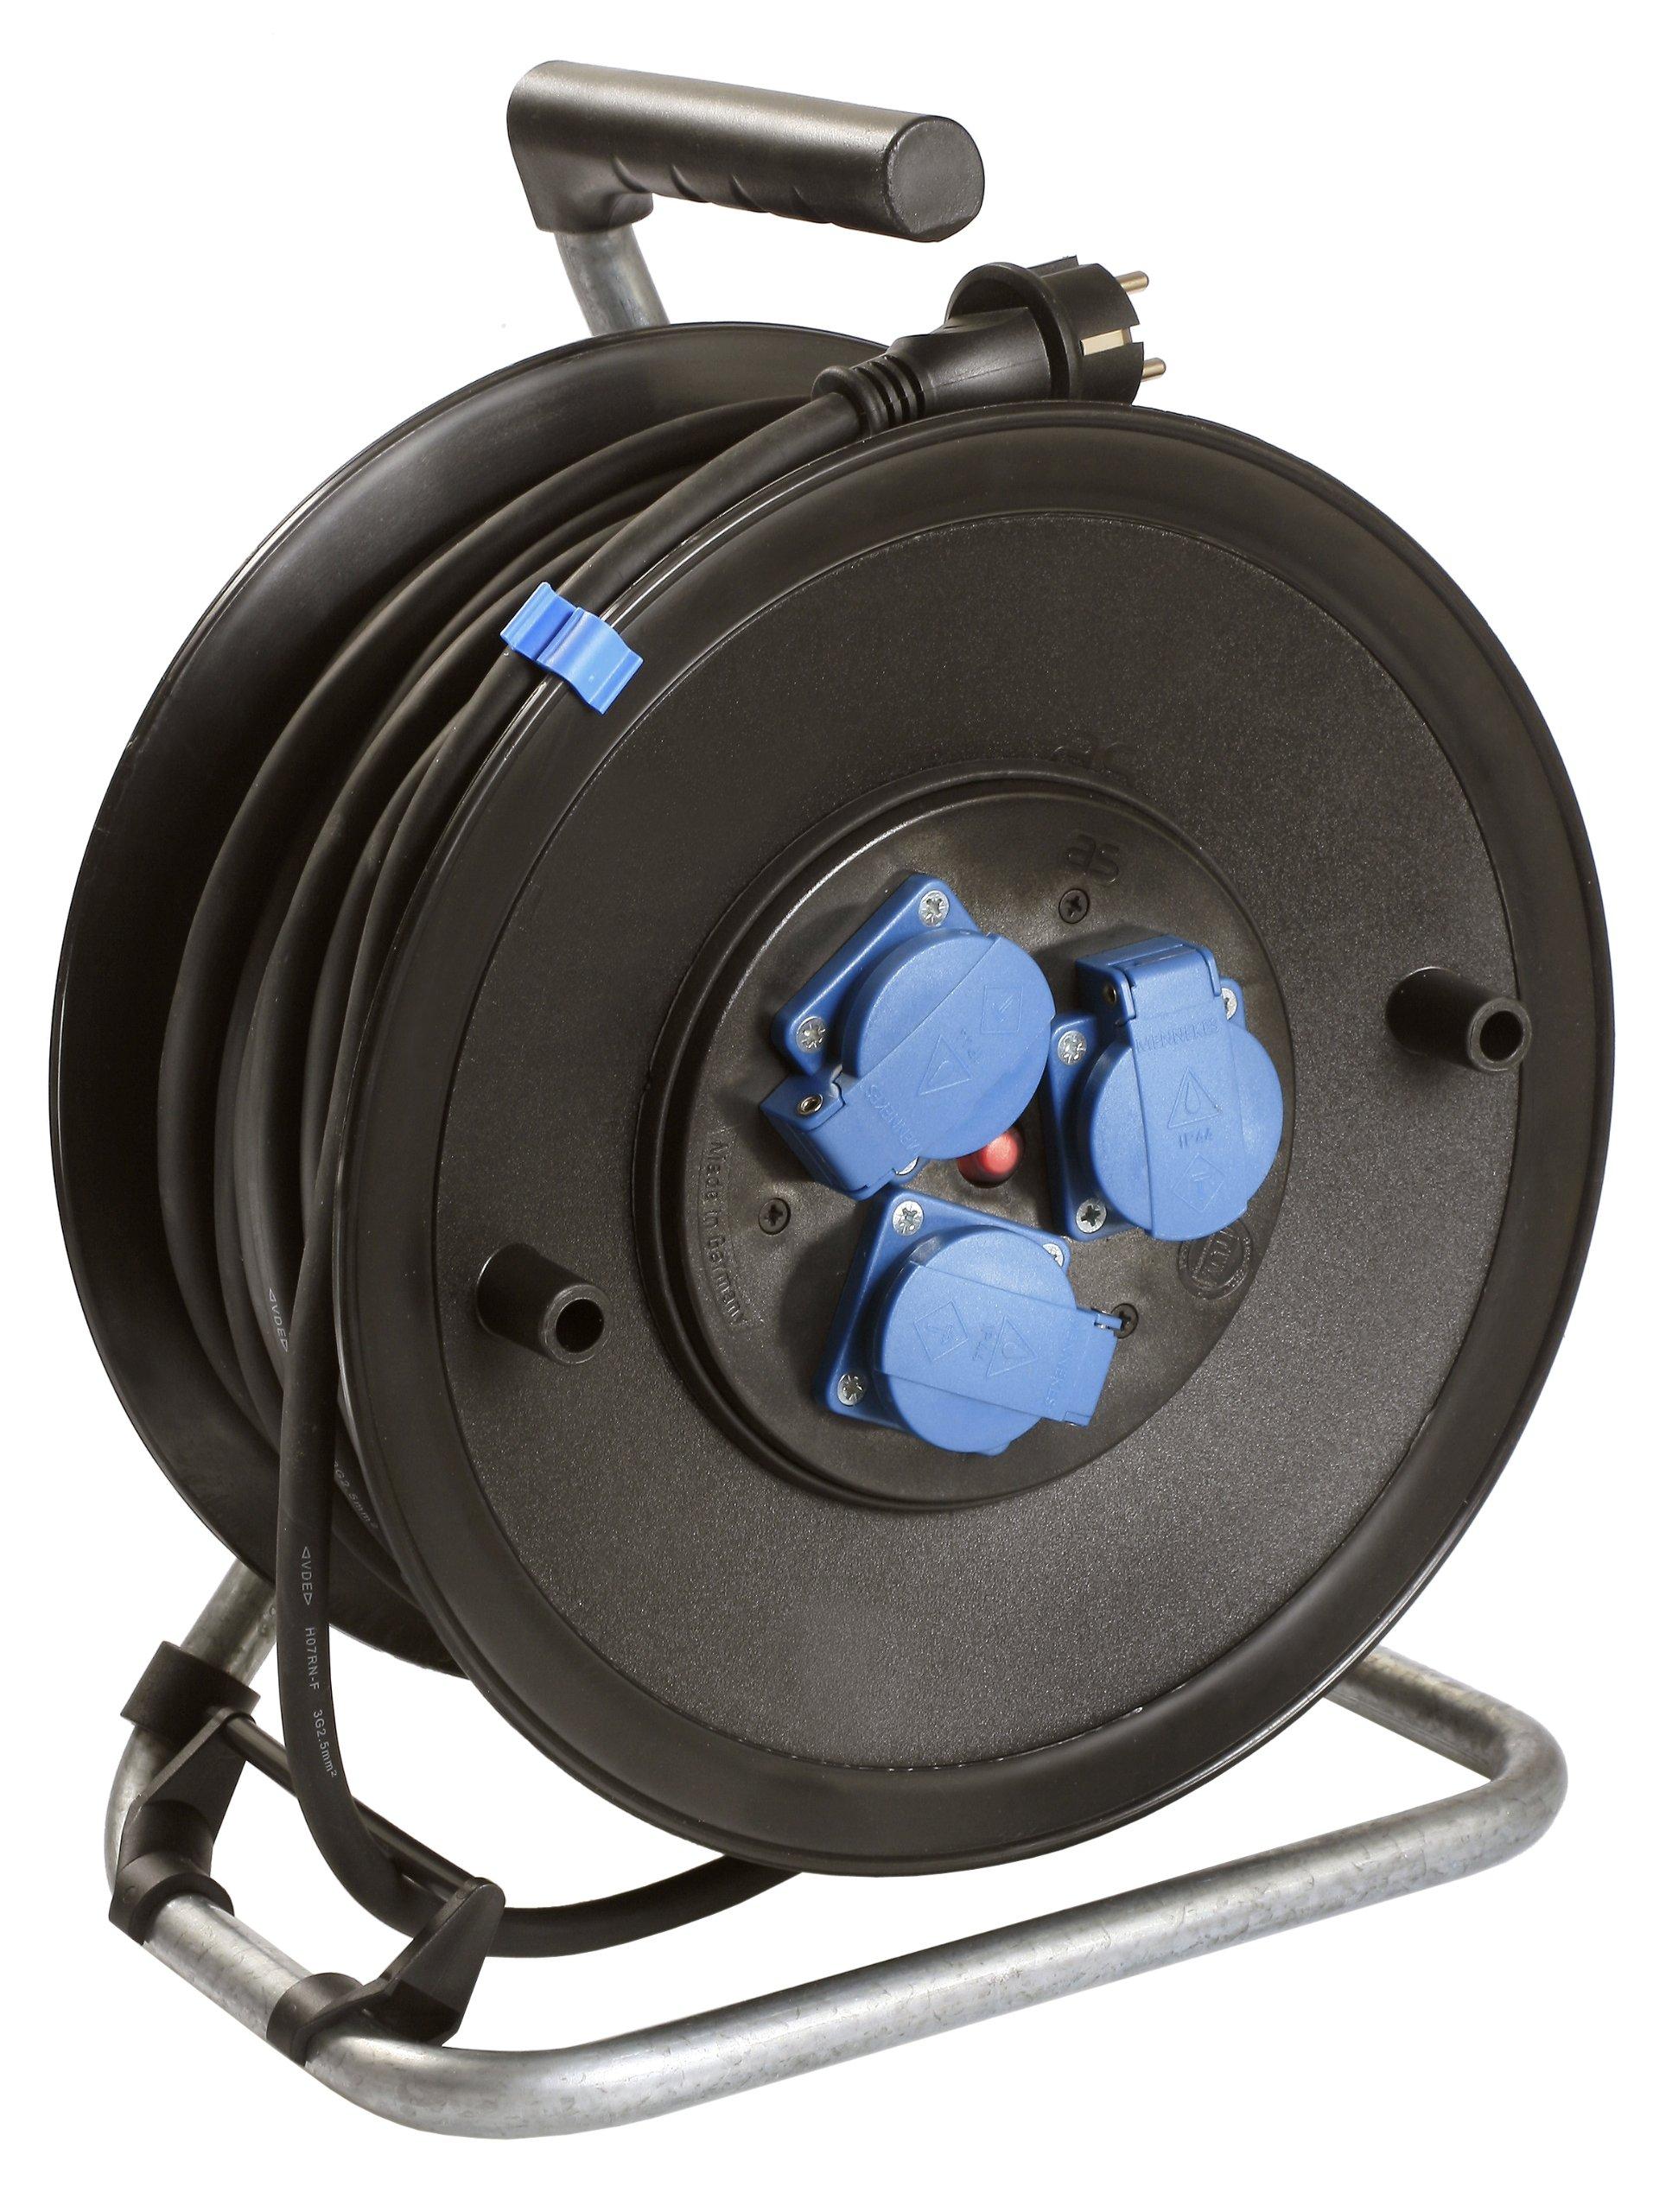 as - Schwabe, 880170, As-Schwabe 880 170 Cavo professionale bobina 285 mm, 230 V / 16 A, Barella, r